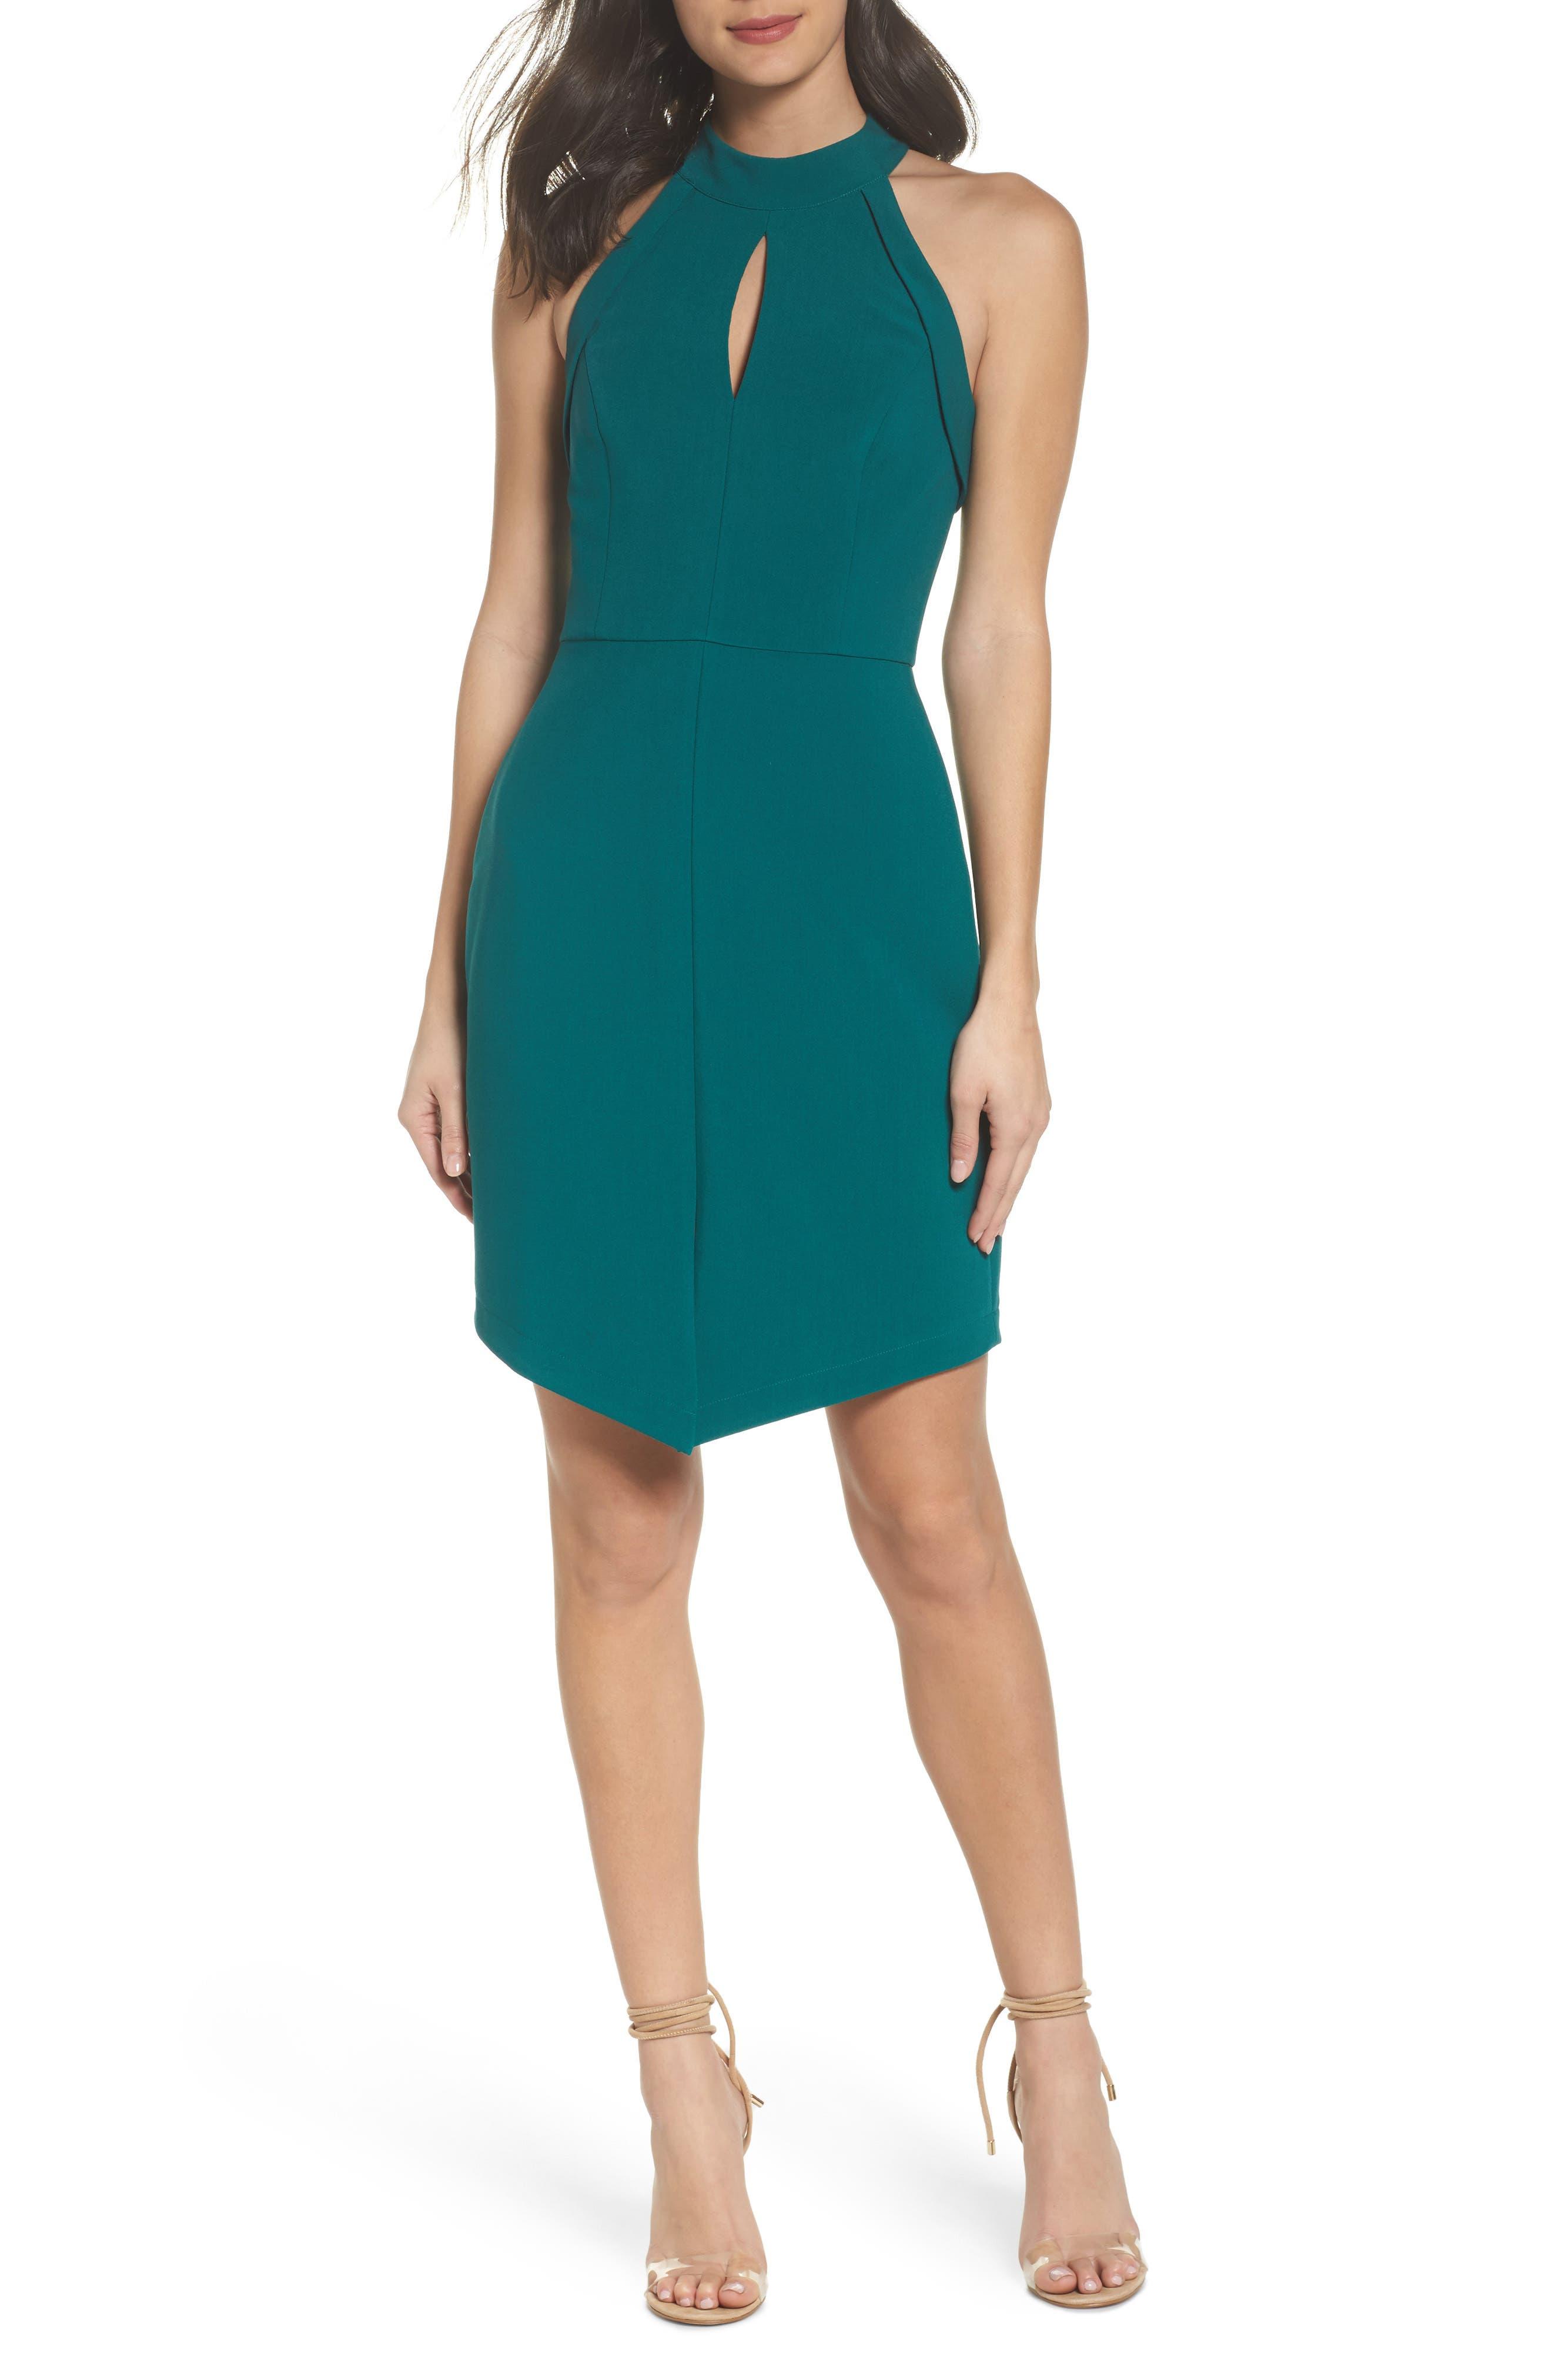 Alternate Image 1 Selected - Adelyn Rae Marlena Sheath Dress